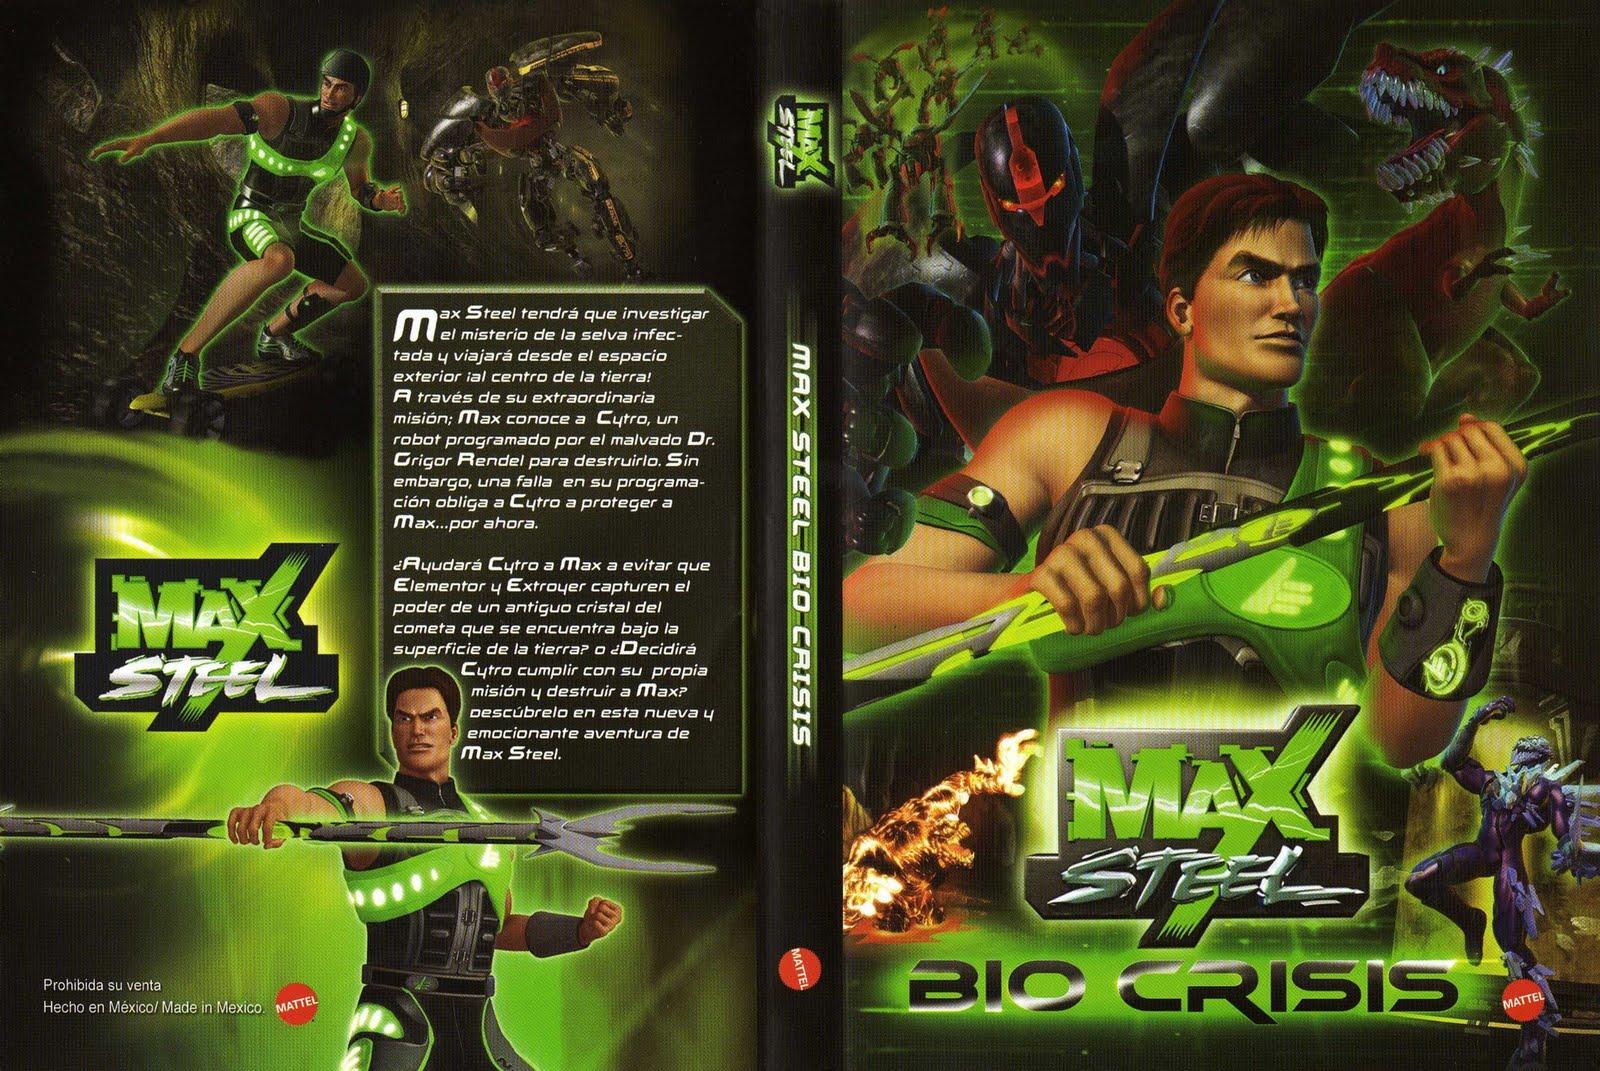 Max Steel Bio Crisis